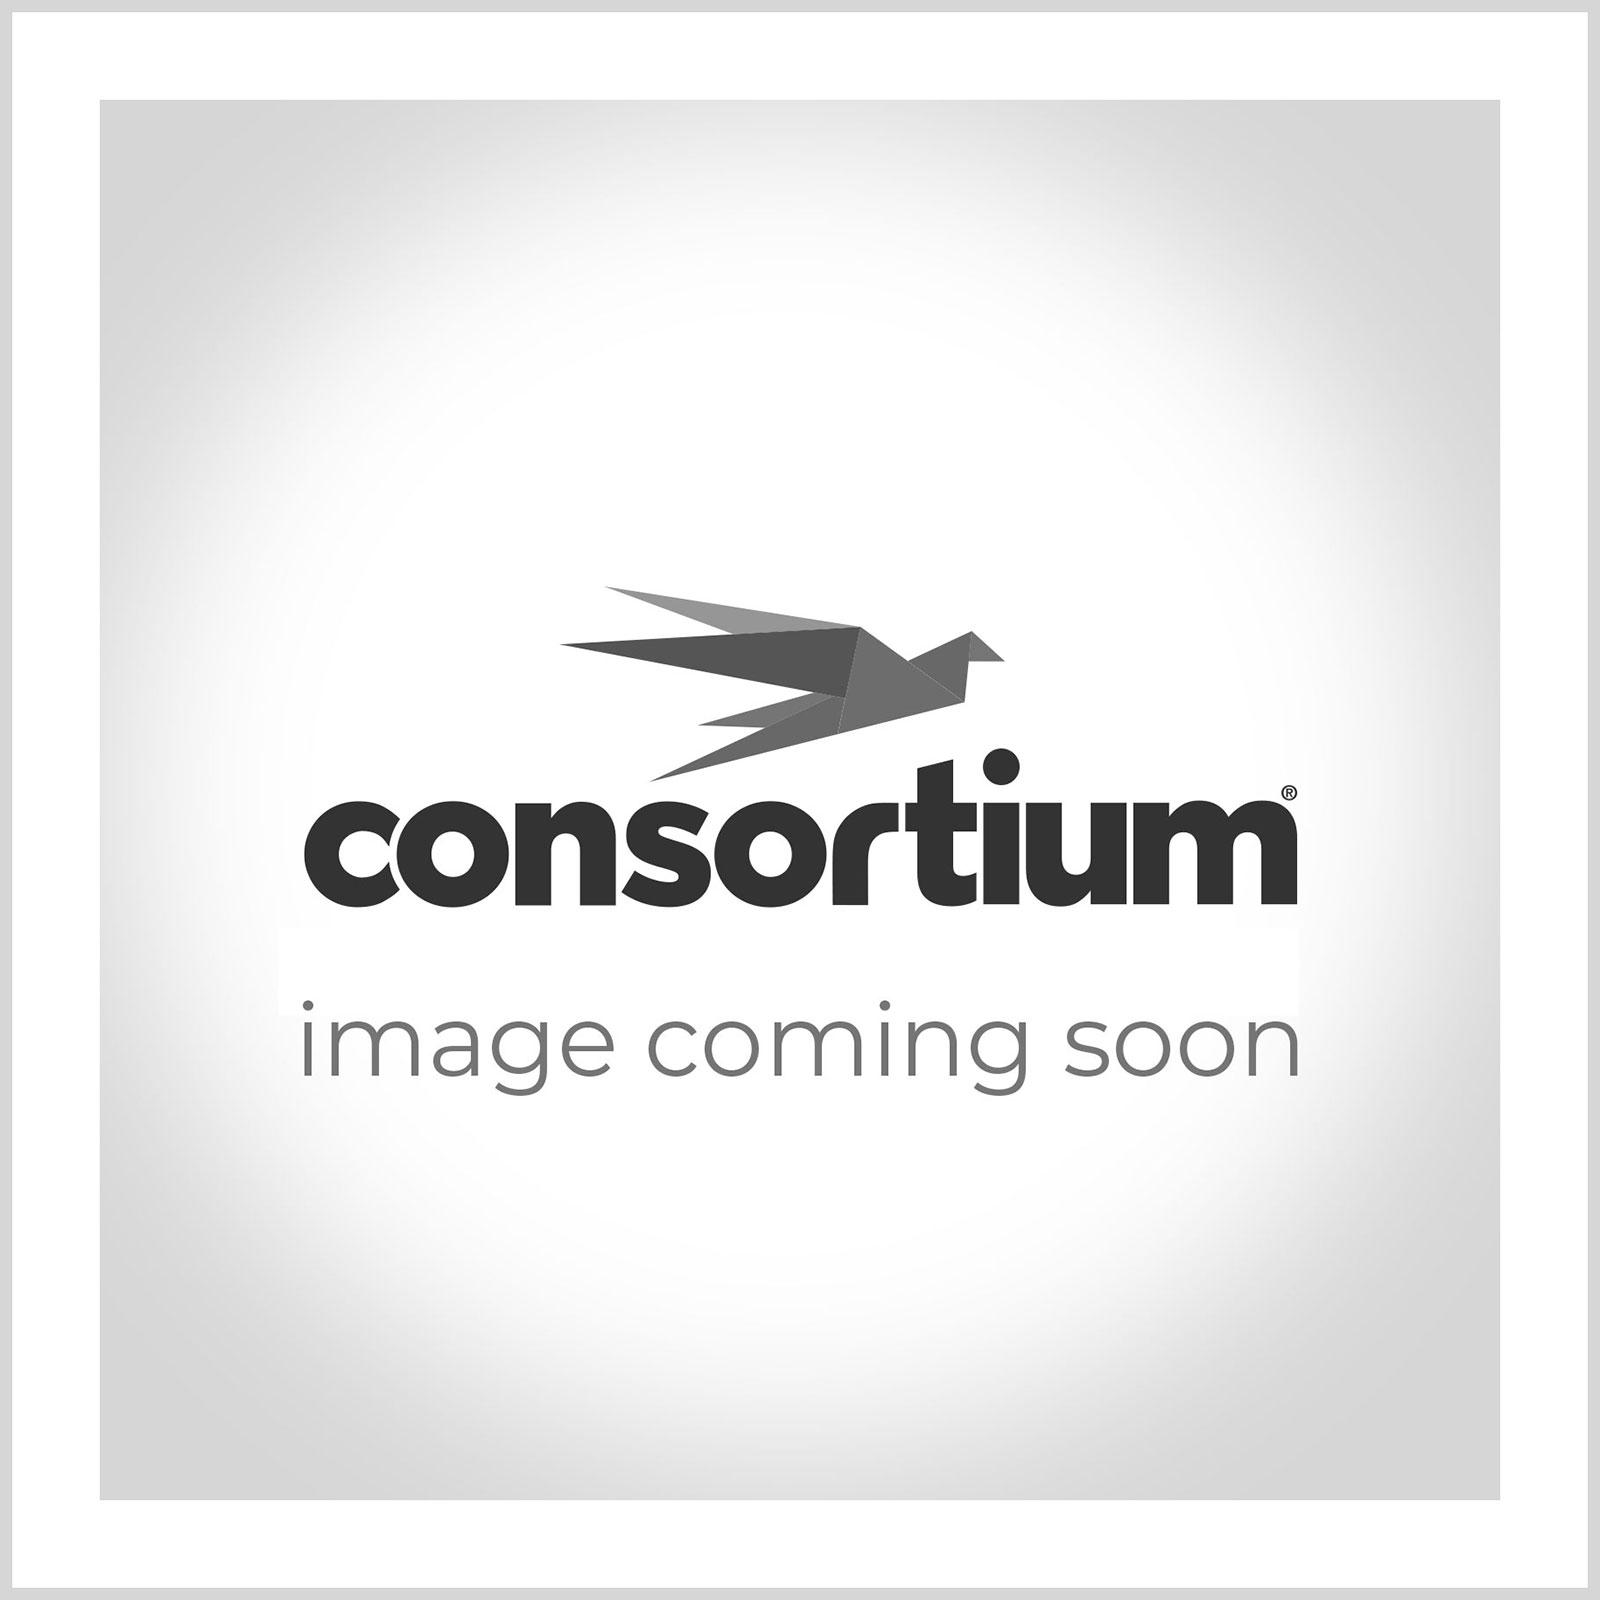 3 Shelf Foolscap Maple Bookcase